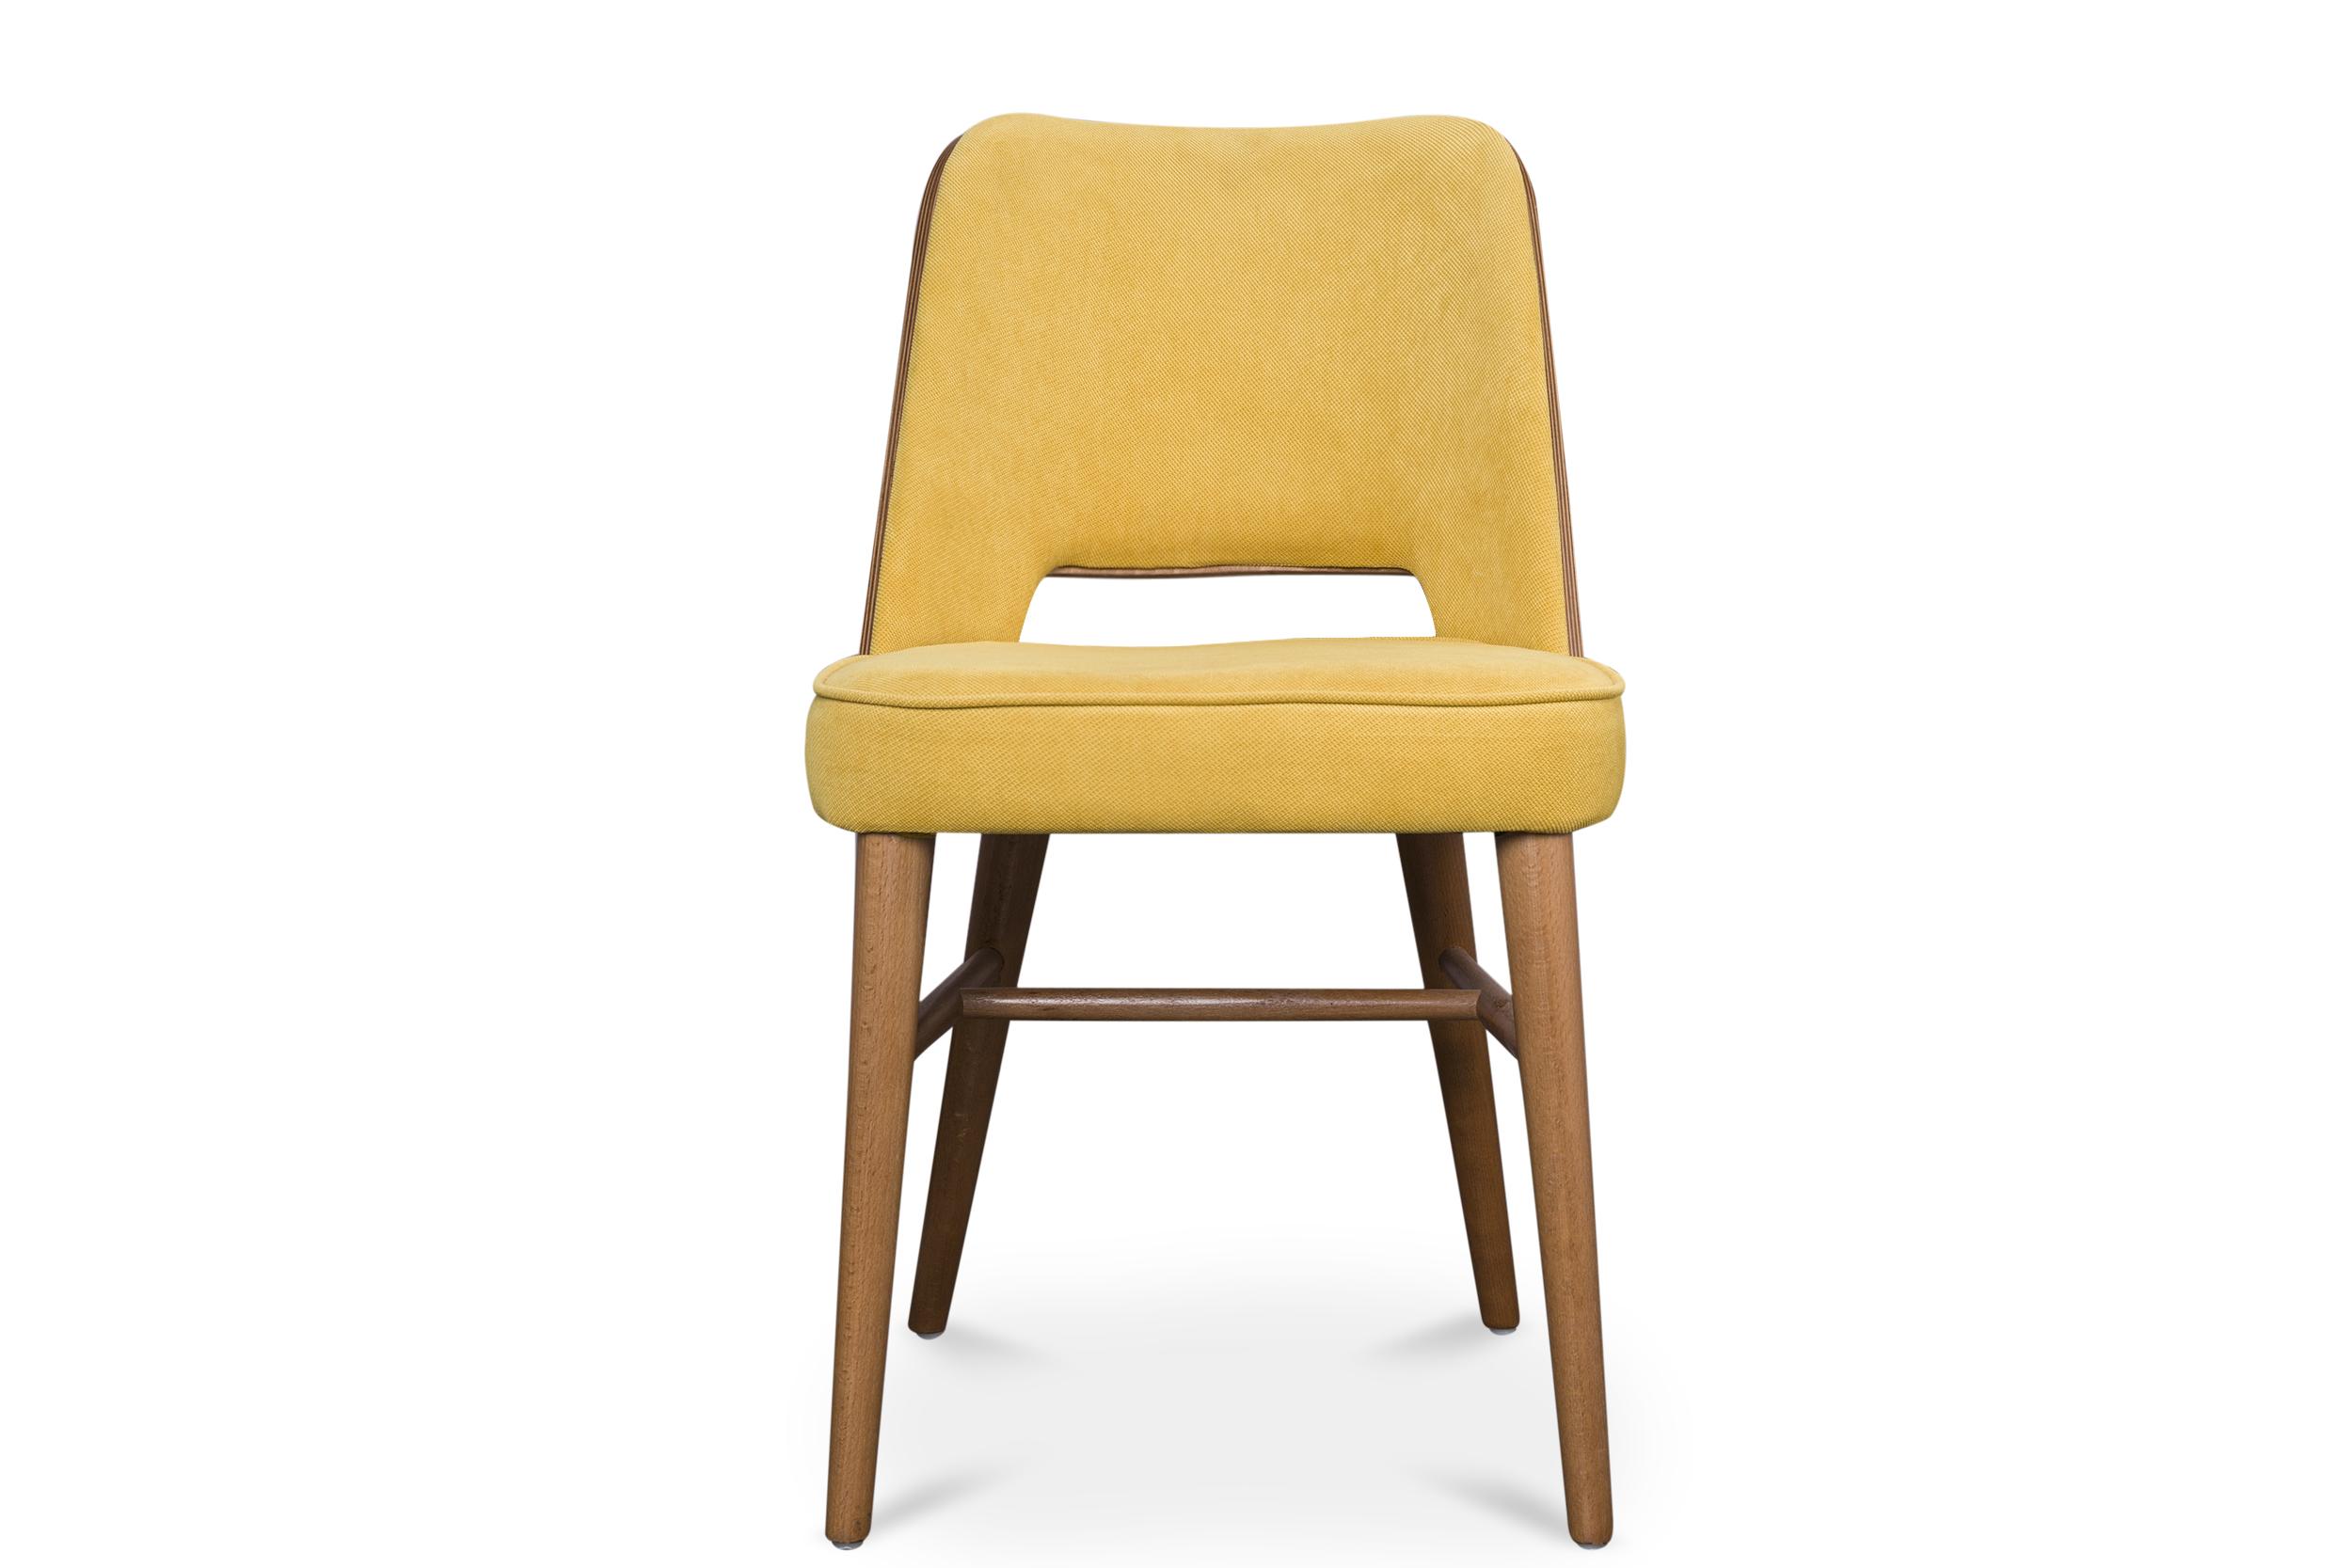 Кухонный стул MyFurnish 15445293 от thefurnish